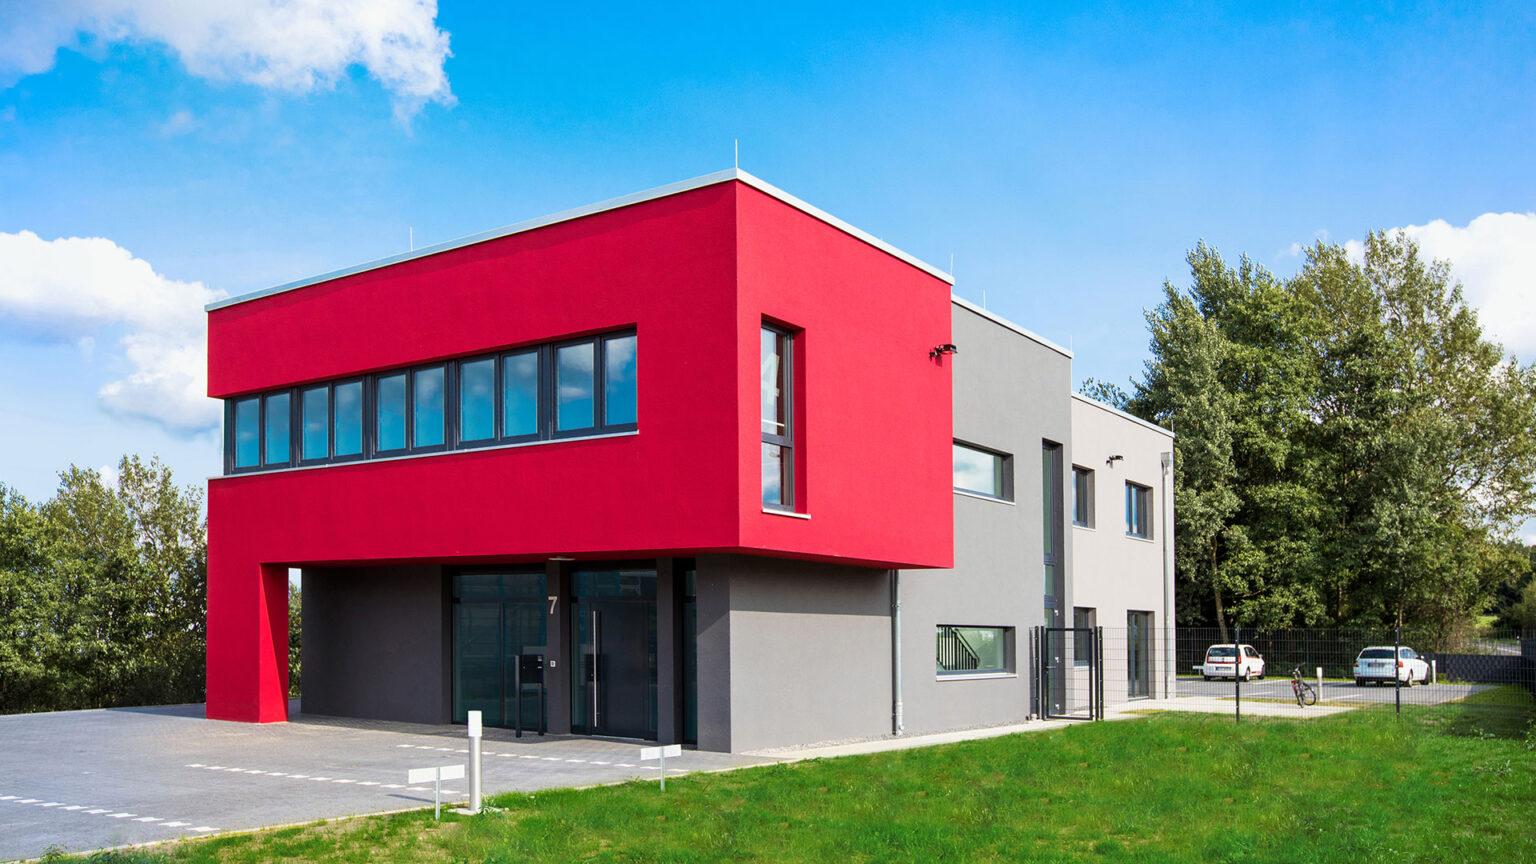 Gebäudeansicht Osnabrücker Werbeagentur team4media an der Lengericher Landstraße 7